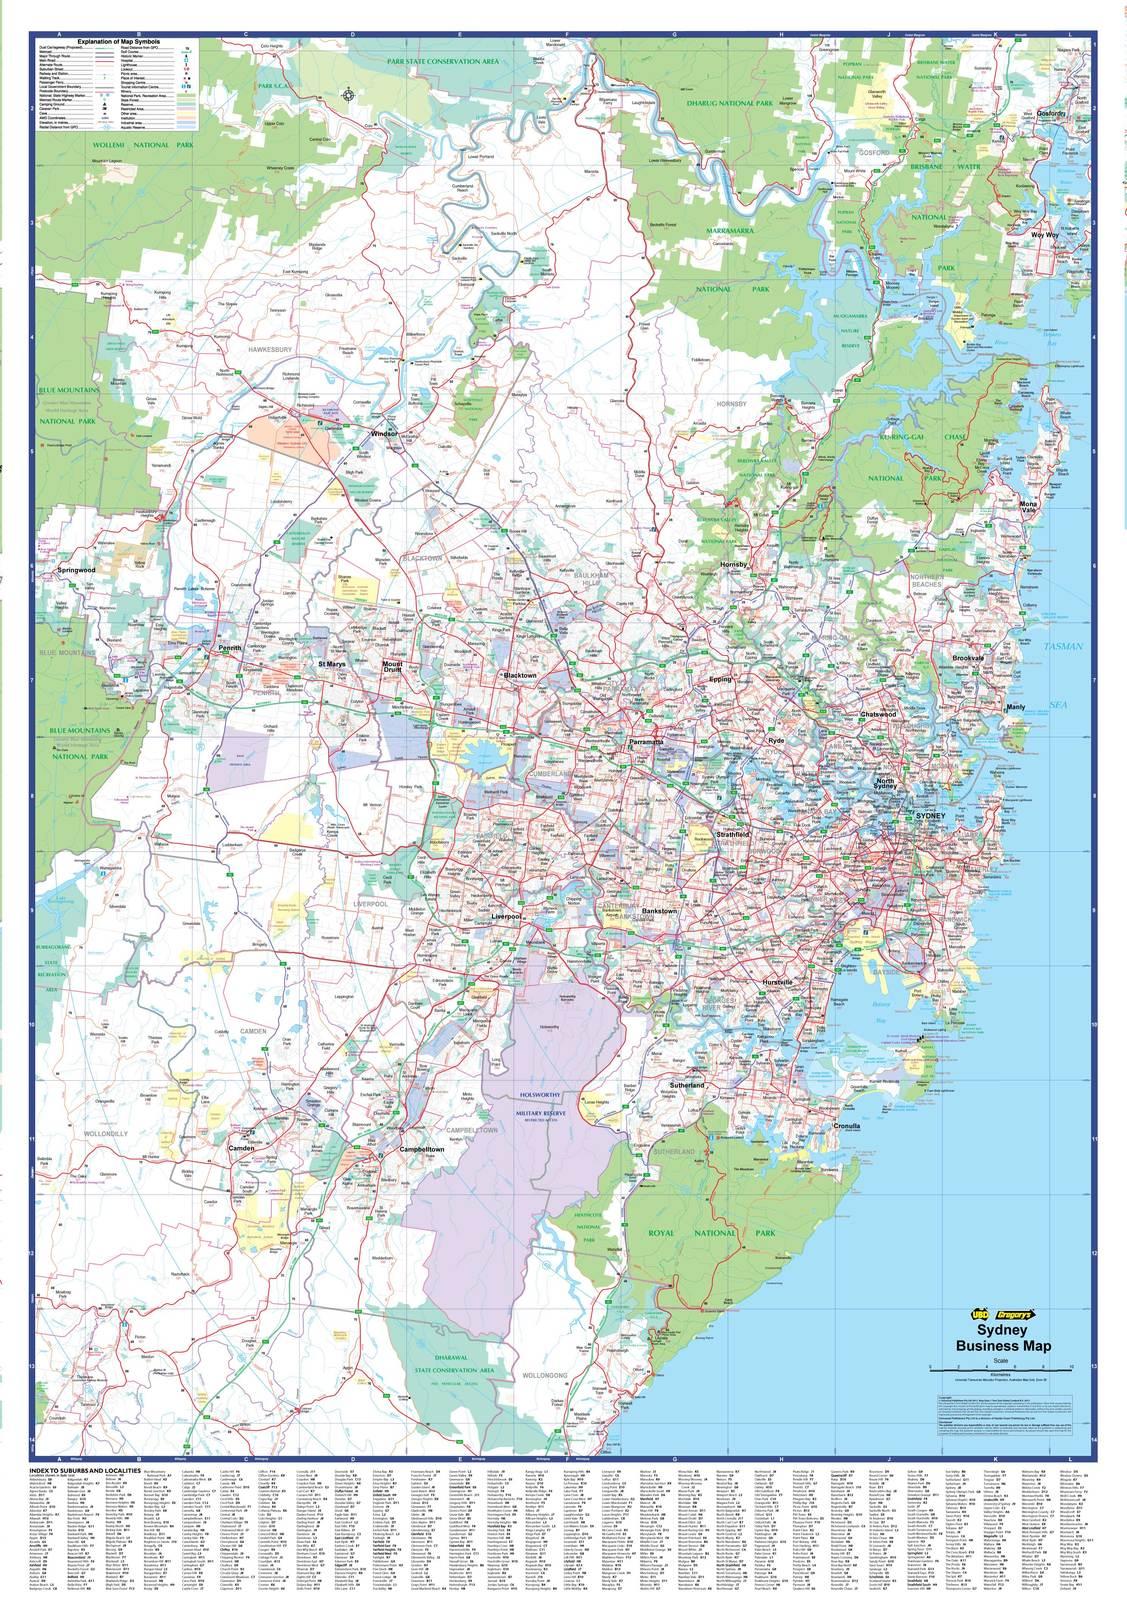 Sydney Business Ubd 265 Laminated Map Wall Map Of Sydney